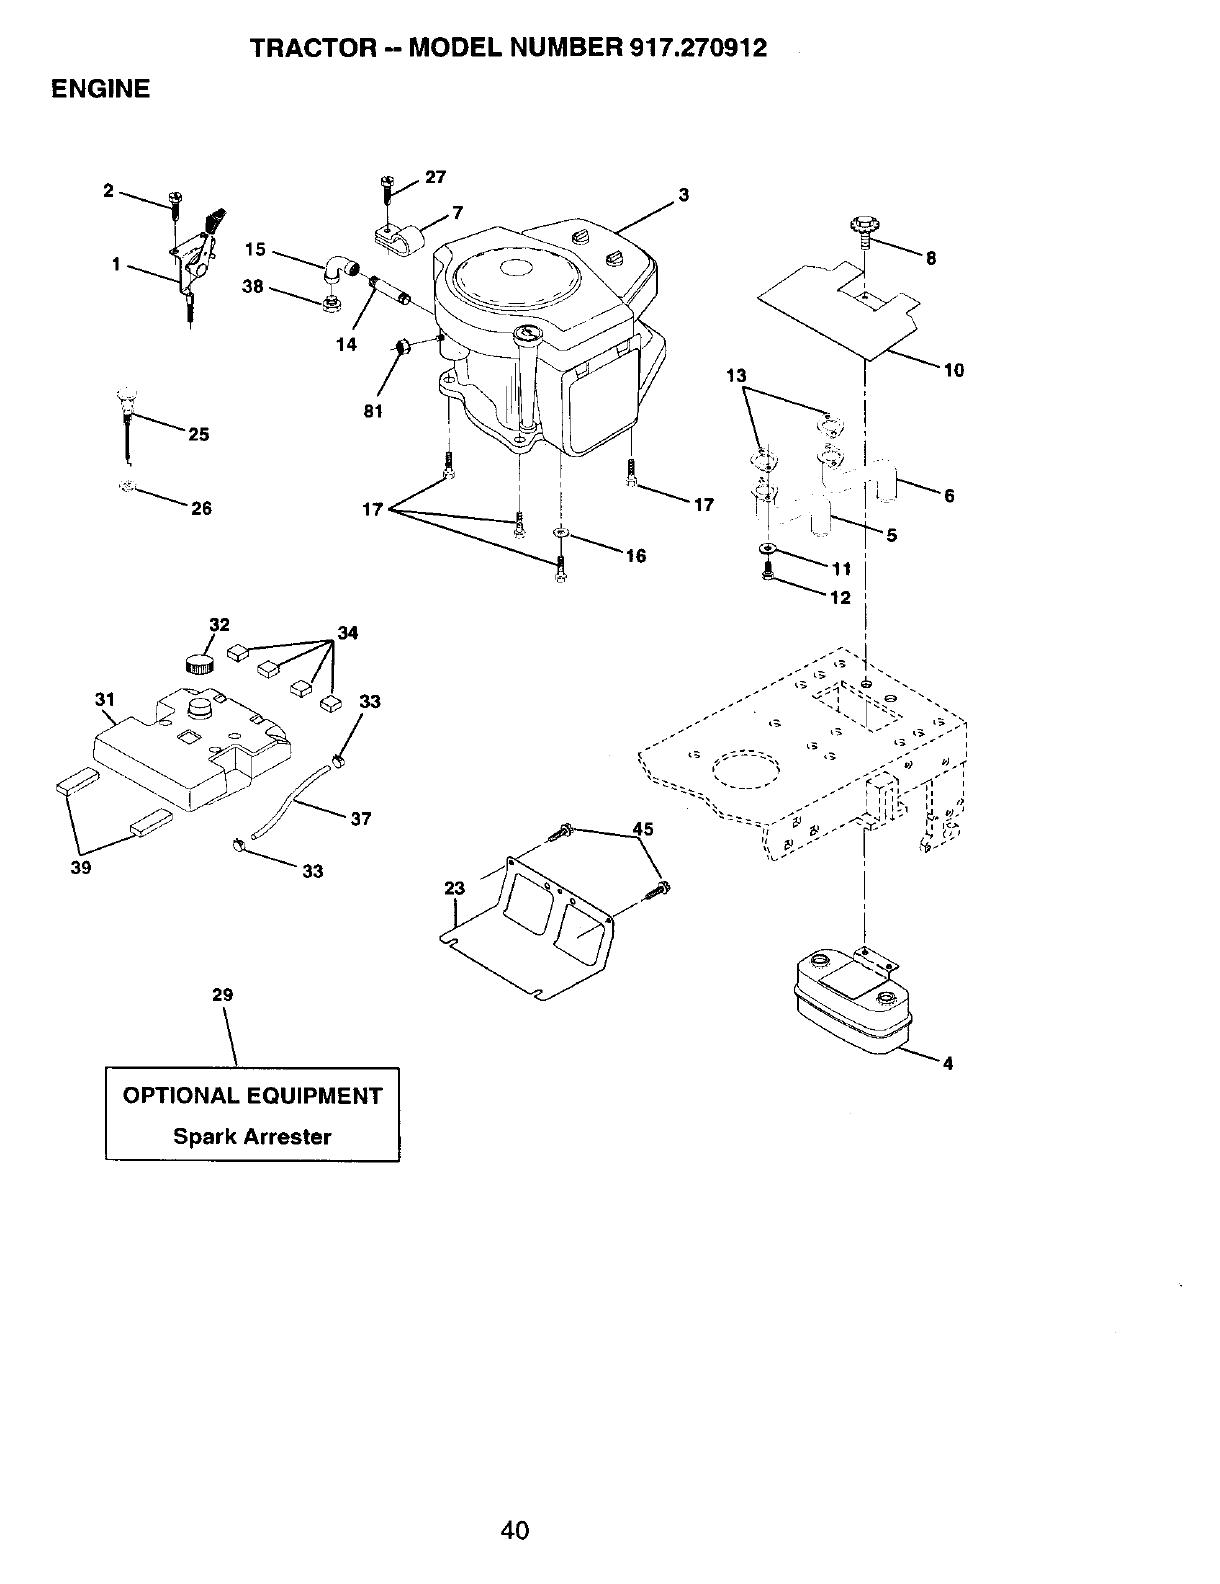 Craftsman 917270912 User Manual 19.5HP 42 LAWN TRACTOR